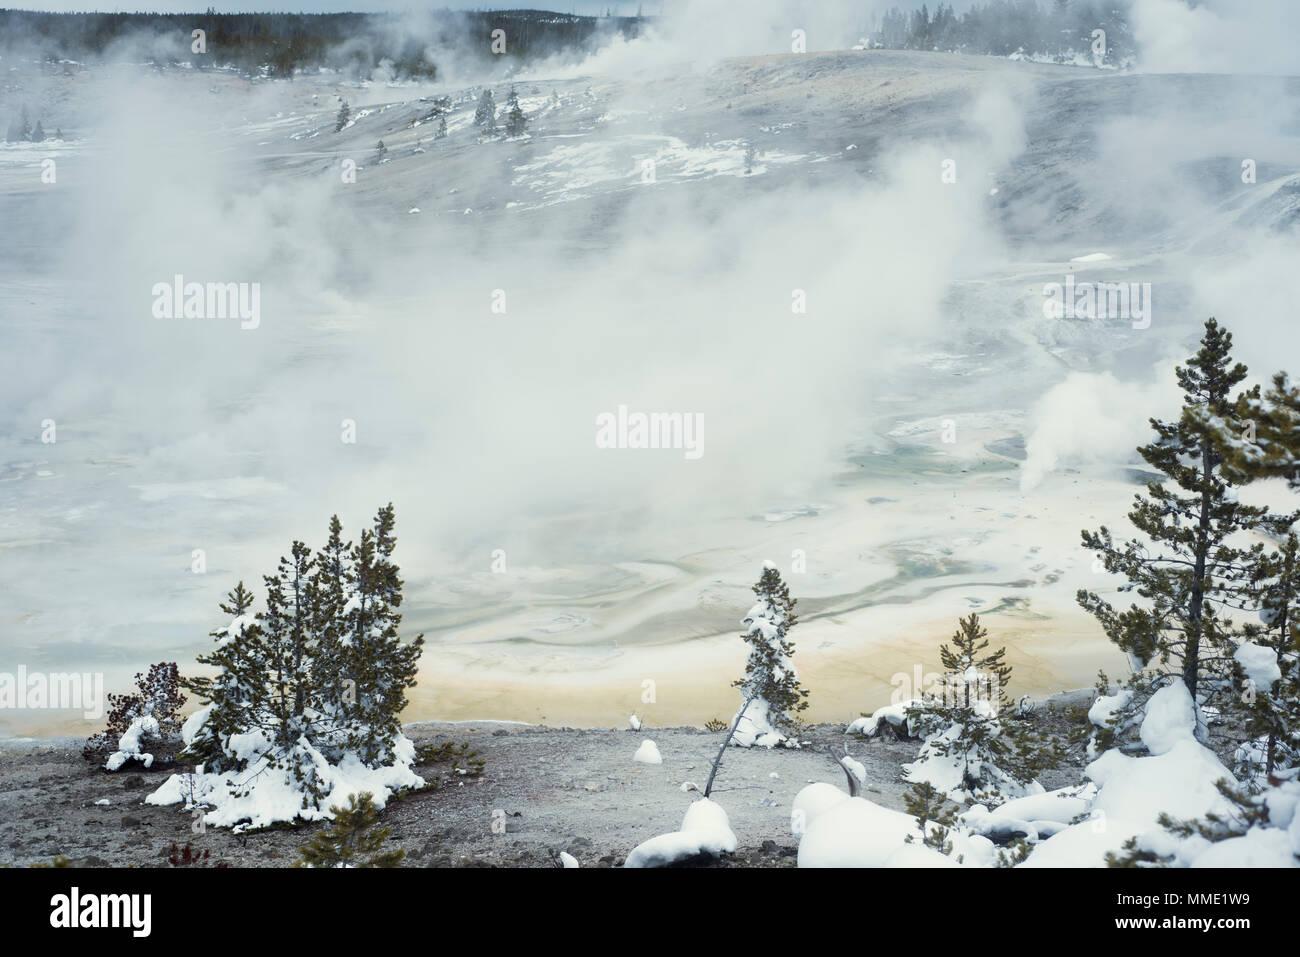 Norris Geyser Basin, Yellowstone National Park, Wyoming, United States - Stock Image